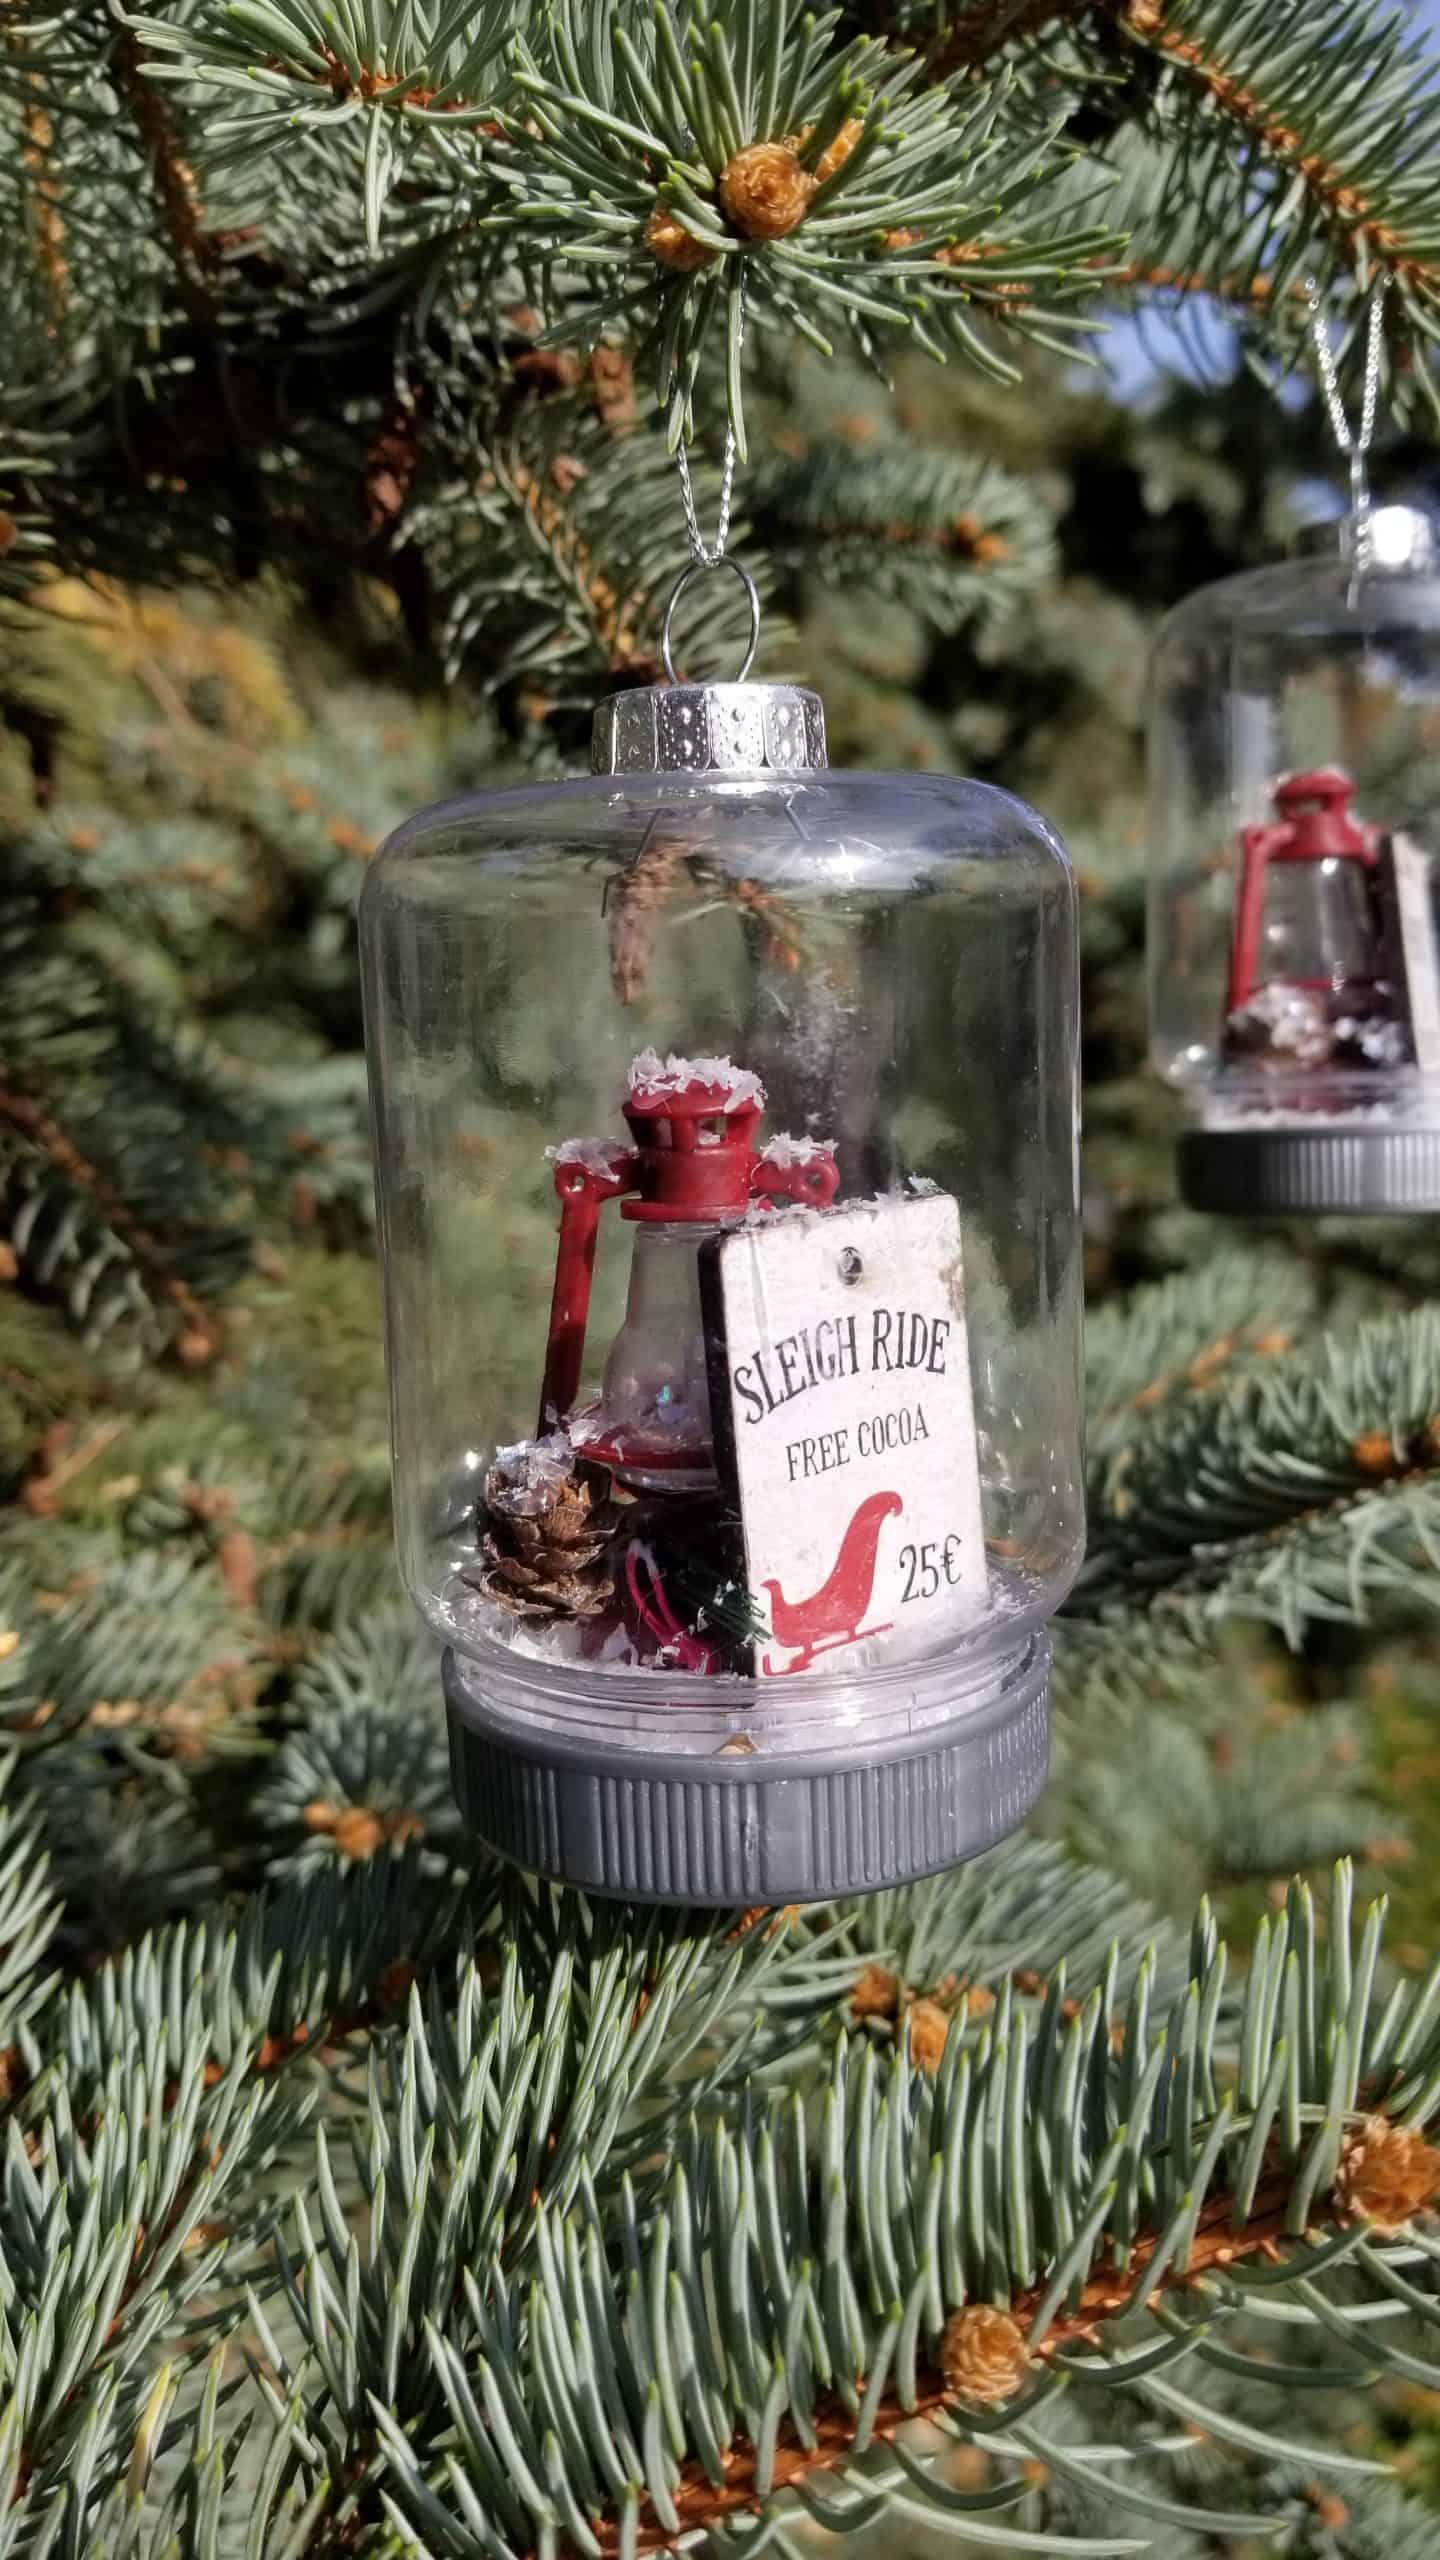 Finished mason jar ornament hanging on a tree.